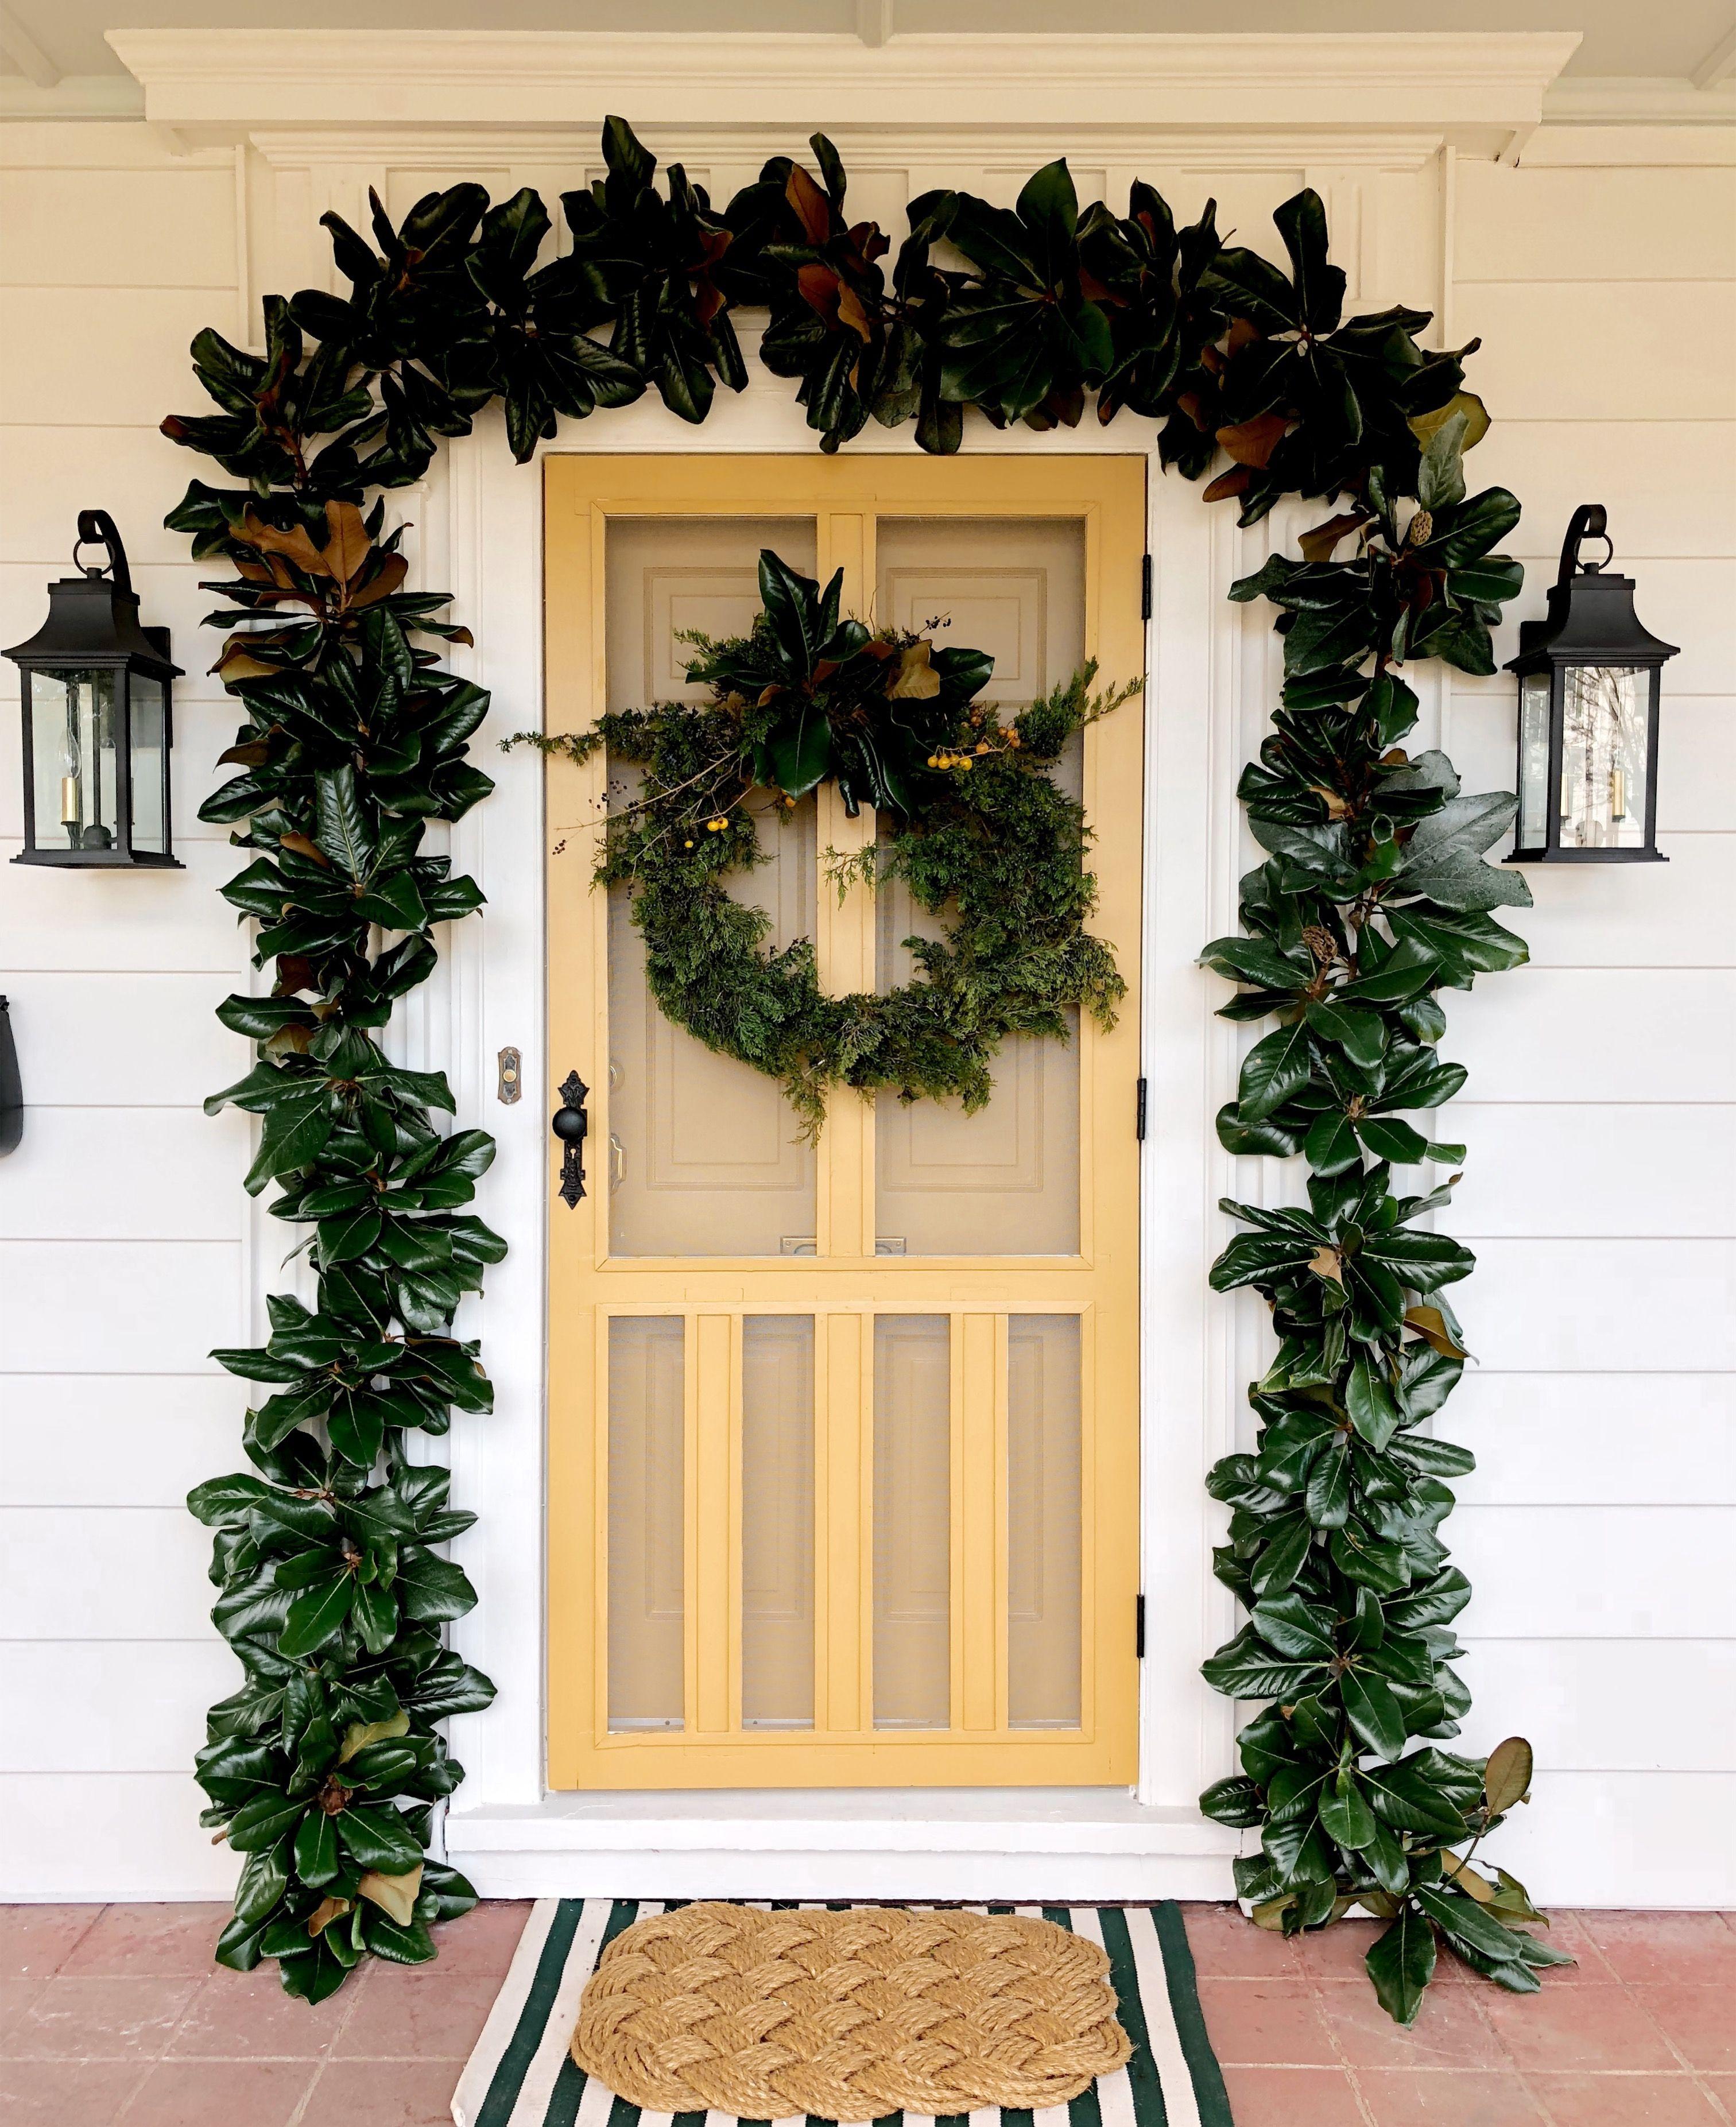 Magnolia Garland Holiday Front Door House 1924 Holiday Decor Magnolia Garland Hinkley Lighting